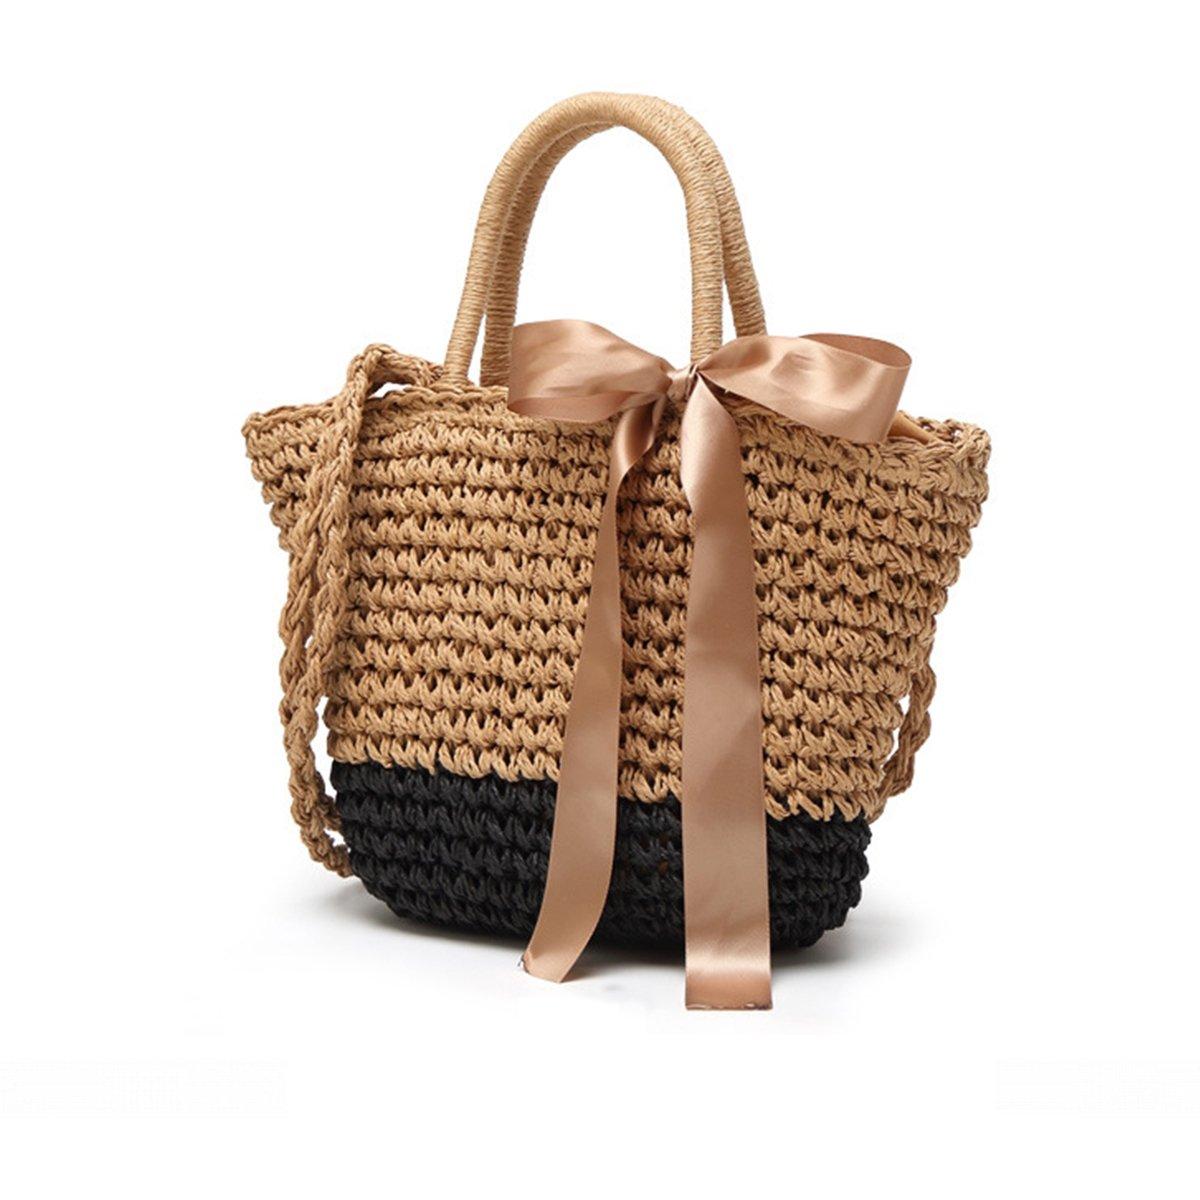 Straw Crossbody Handbag, JOSEKO Women Top Handle Handbag Summer Beach Purse Ladies Shoulder Bag Black 10.62''/7.48''x 5.91''x 7.08''(LxWxH)